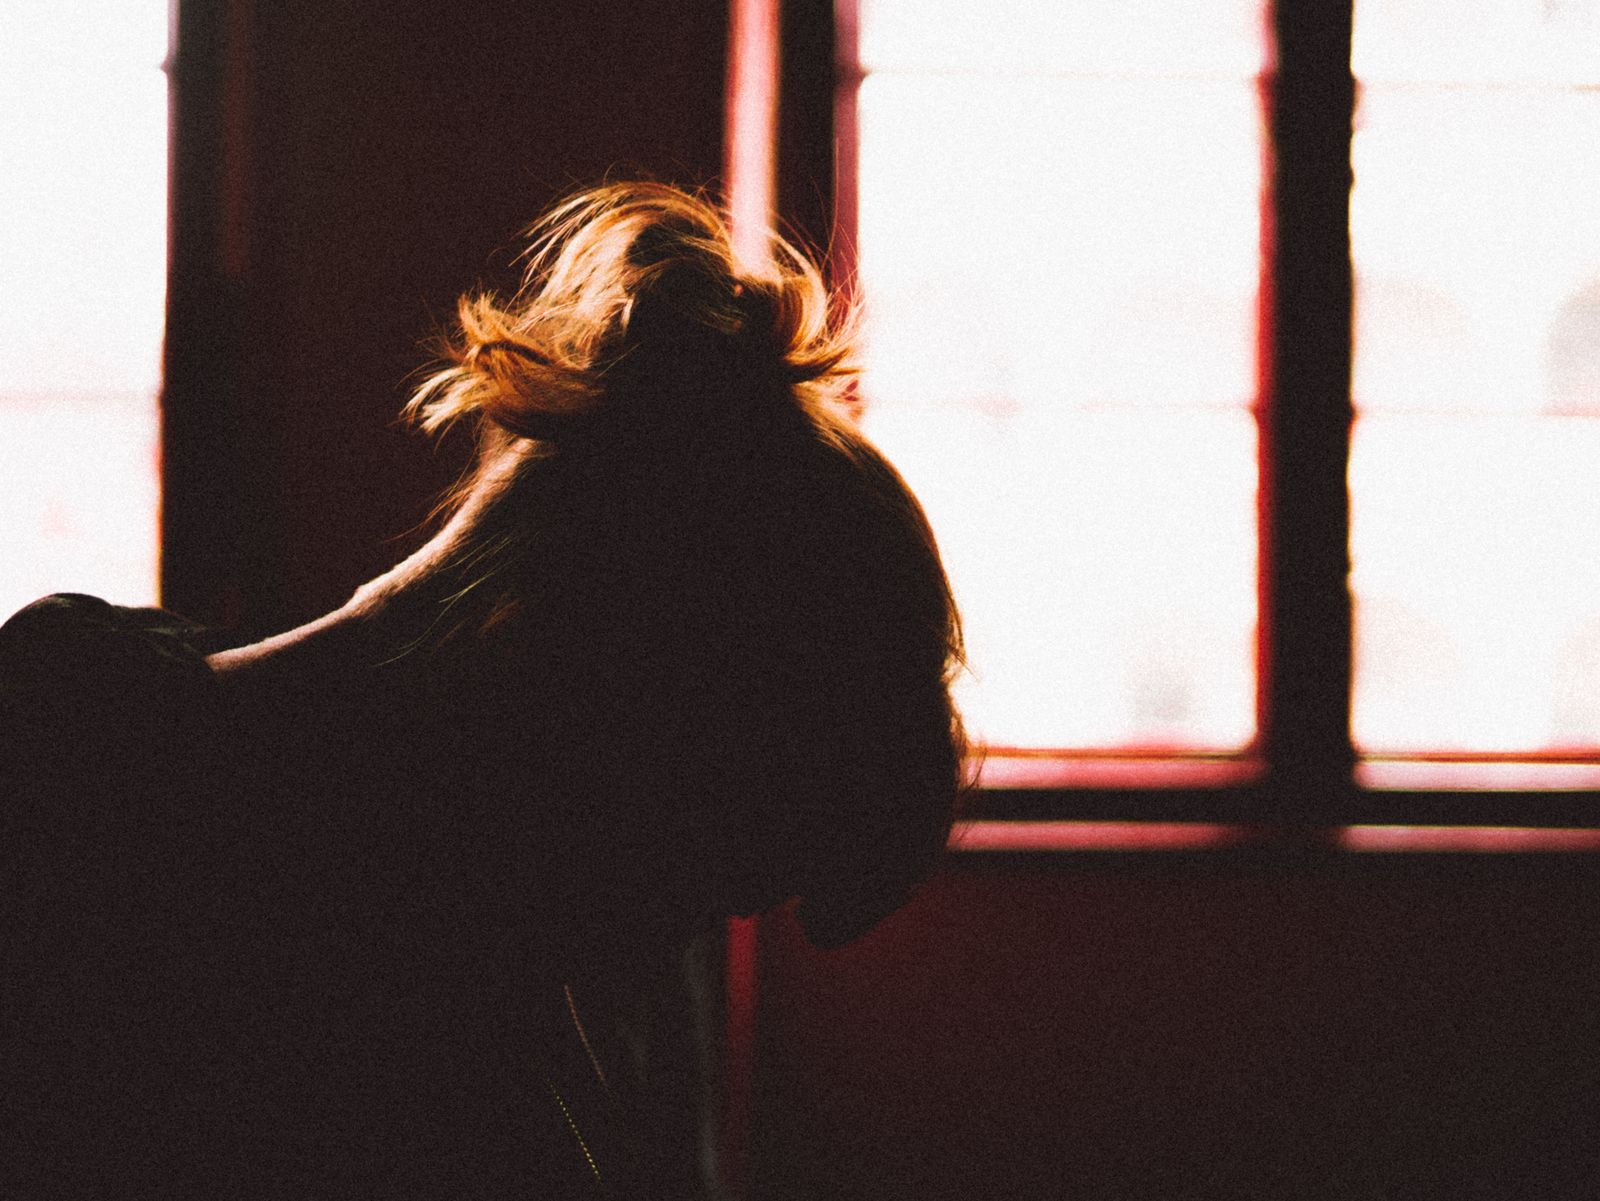 EINMALIGE VERWENDUNG Silhouette Of Depressed Woman EXPIRE 20.11.2023